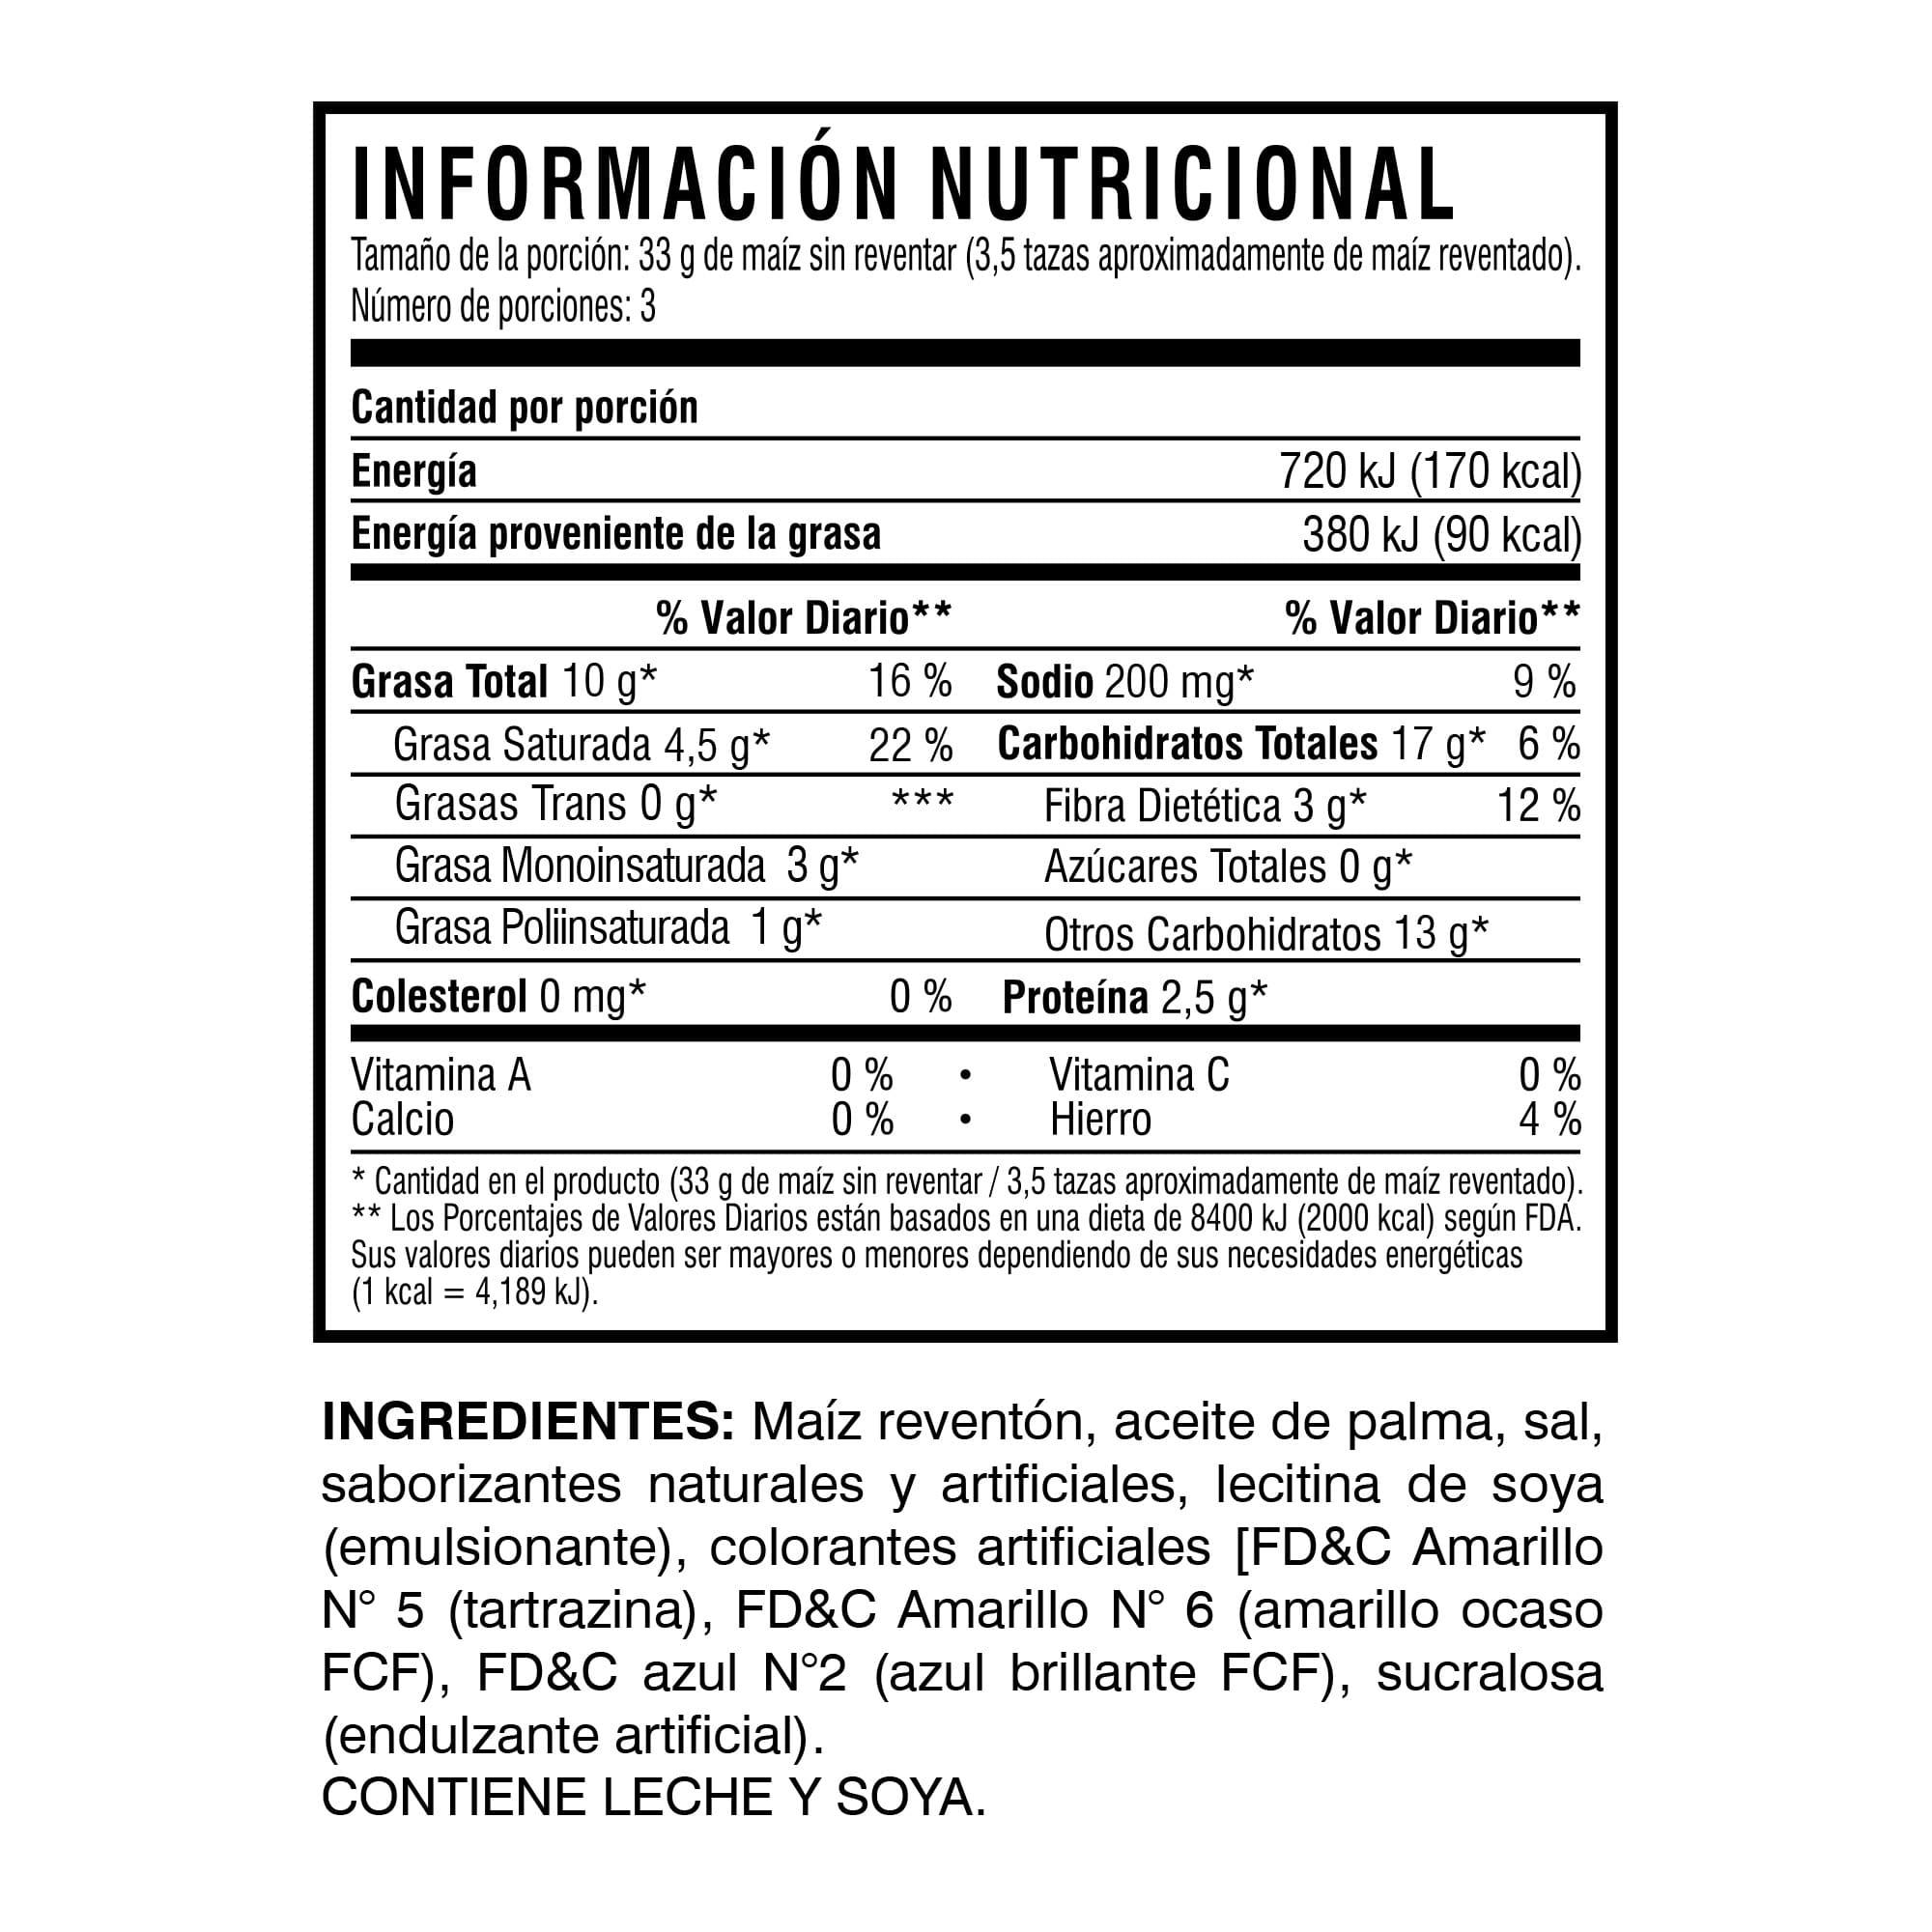 POPI CARAMELO micro Inf Nutric pag web